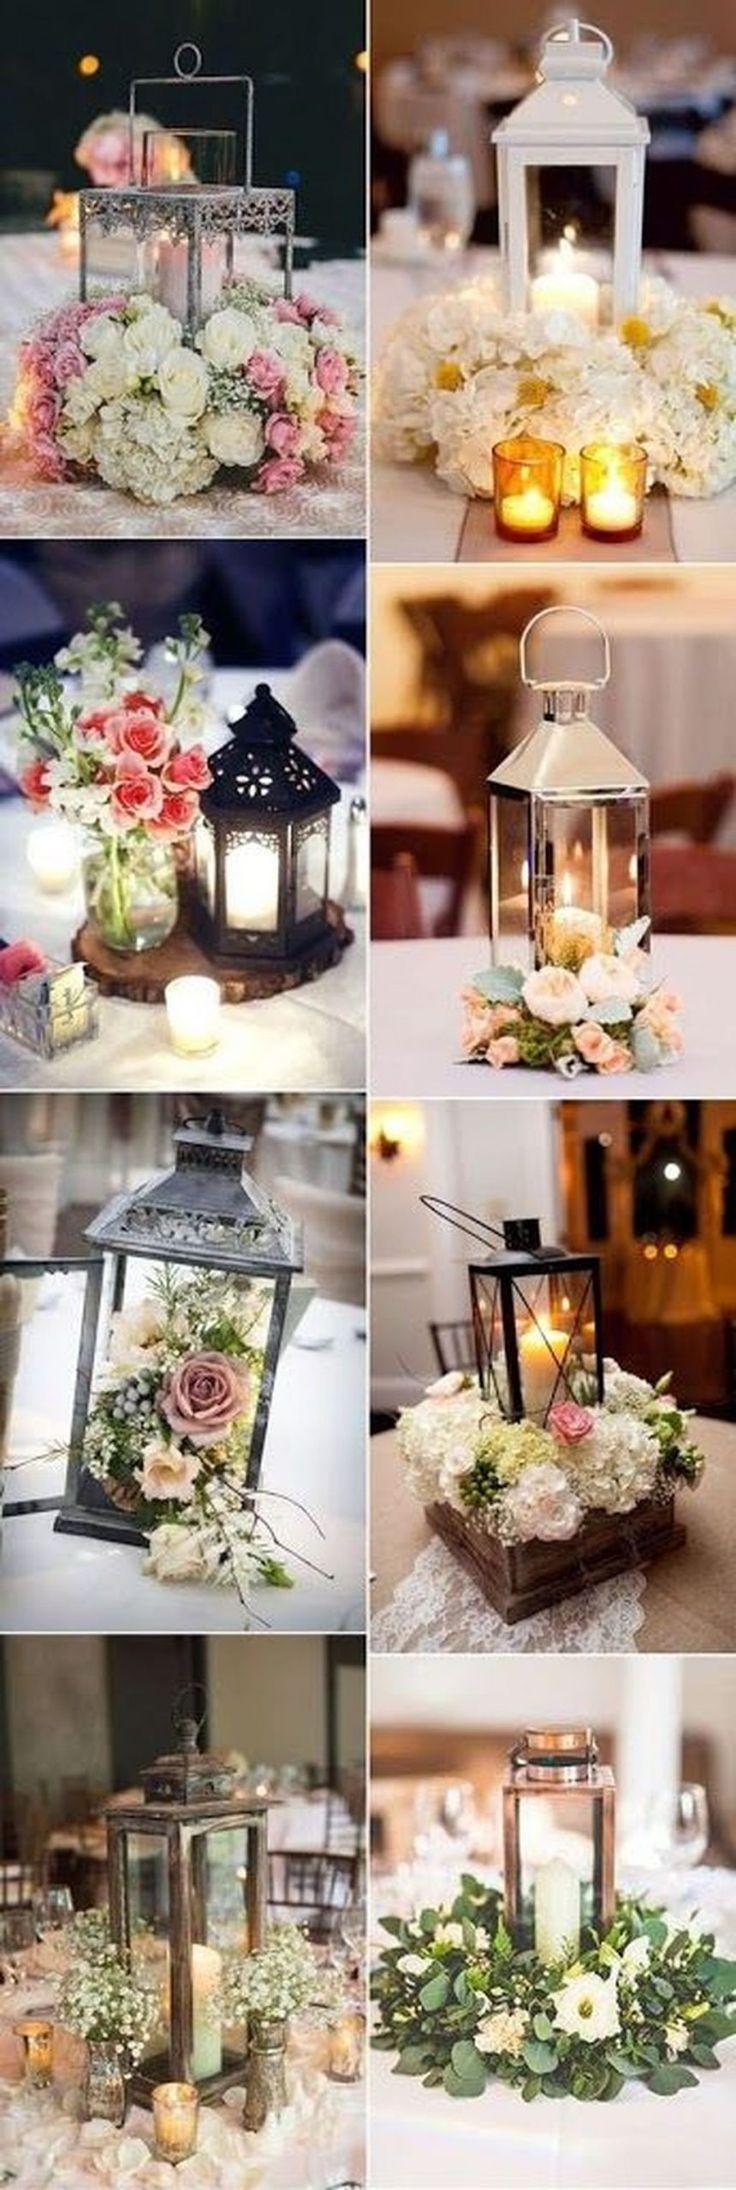 45+ Creative DIY Garden Wedding Decorations Ideas (2